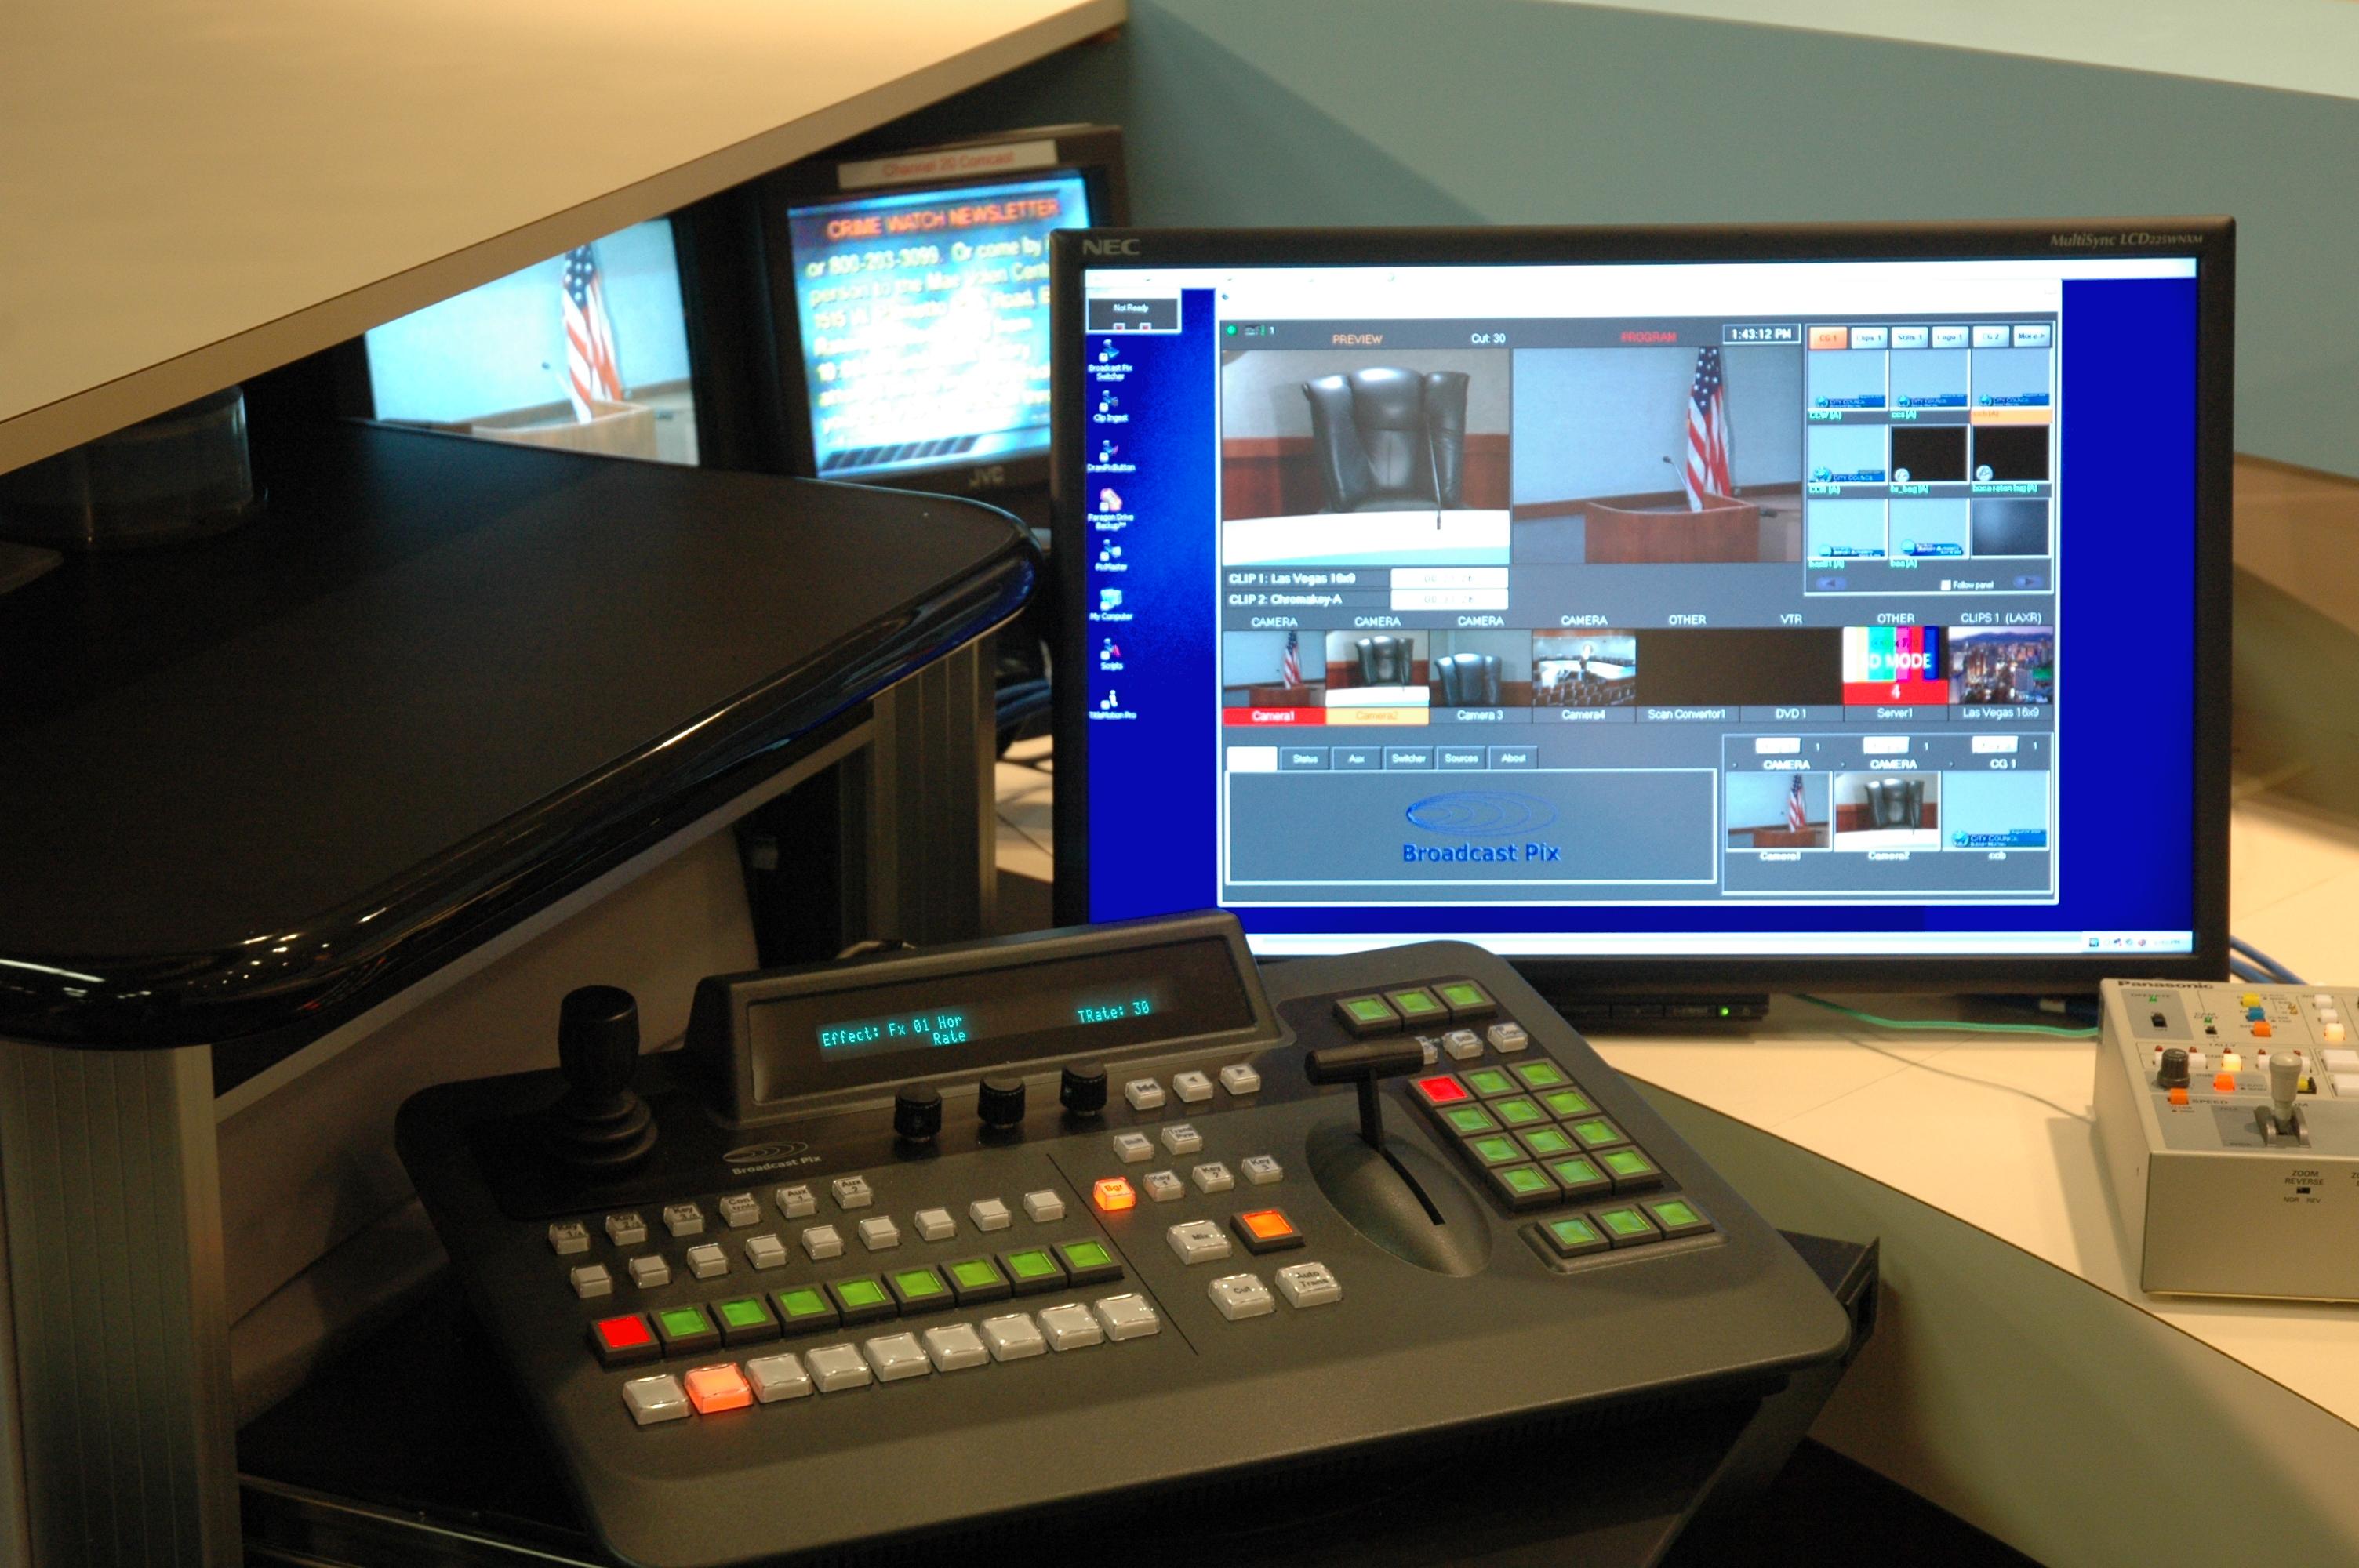 City of Boca Raton Bigfoot BPIX Slate system rotating control panel